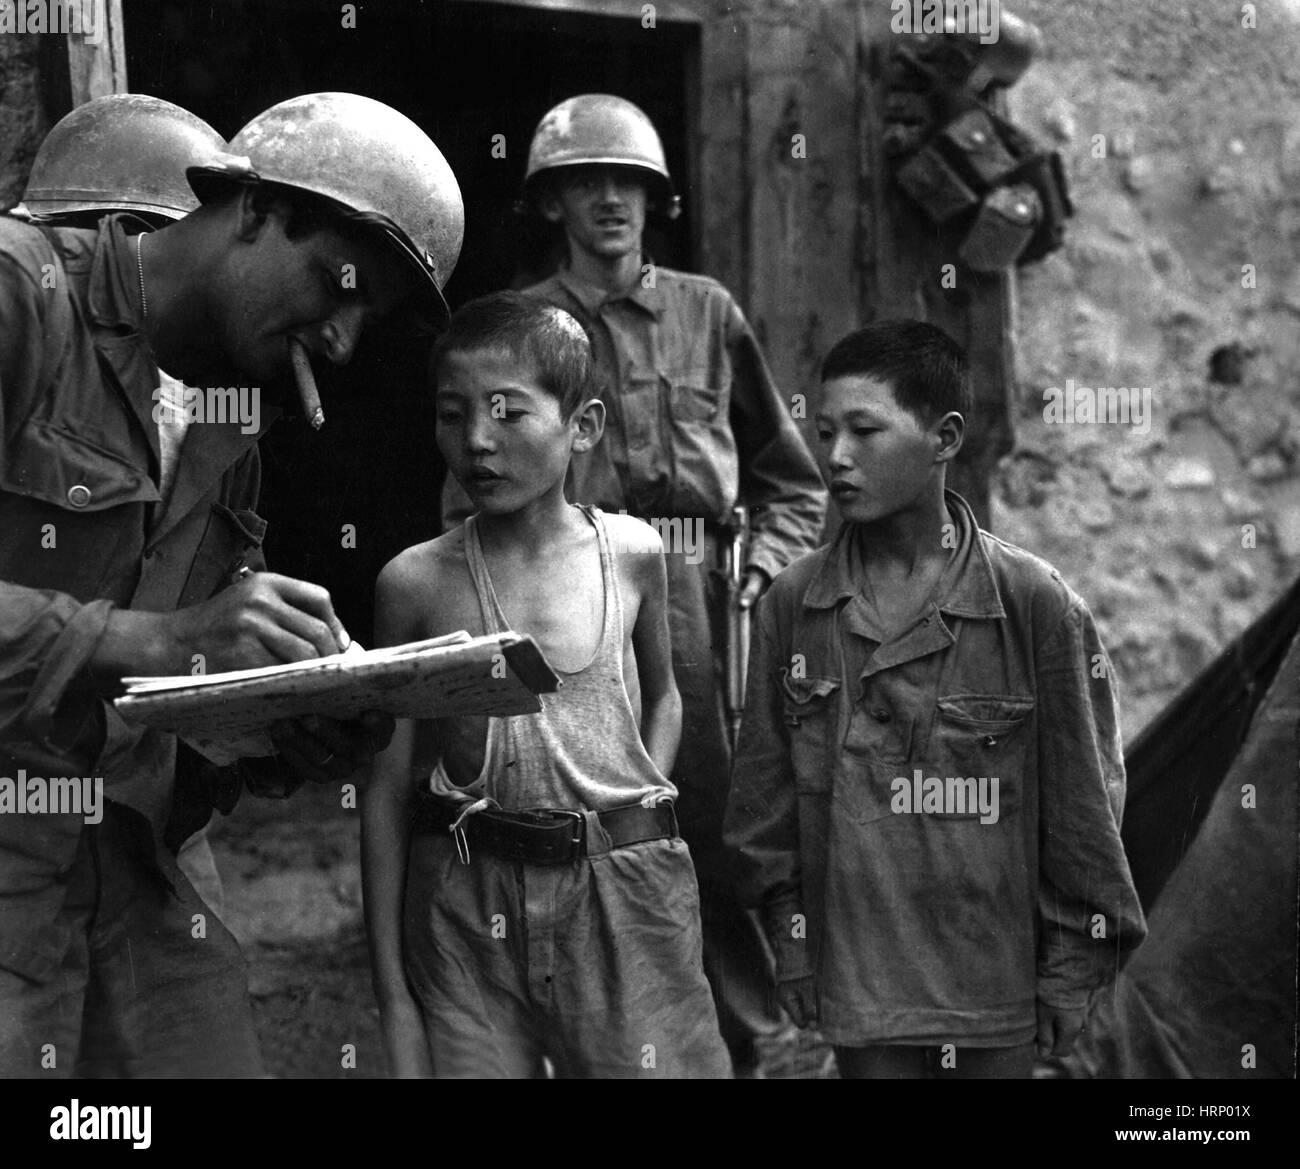 Korea-Krieg, gefangenen Soldaten, 1950 Stockbild